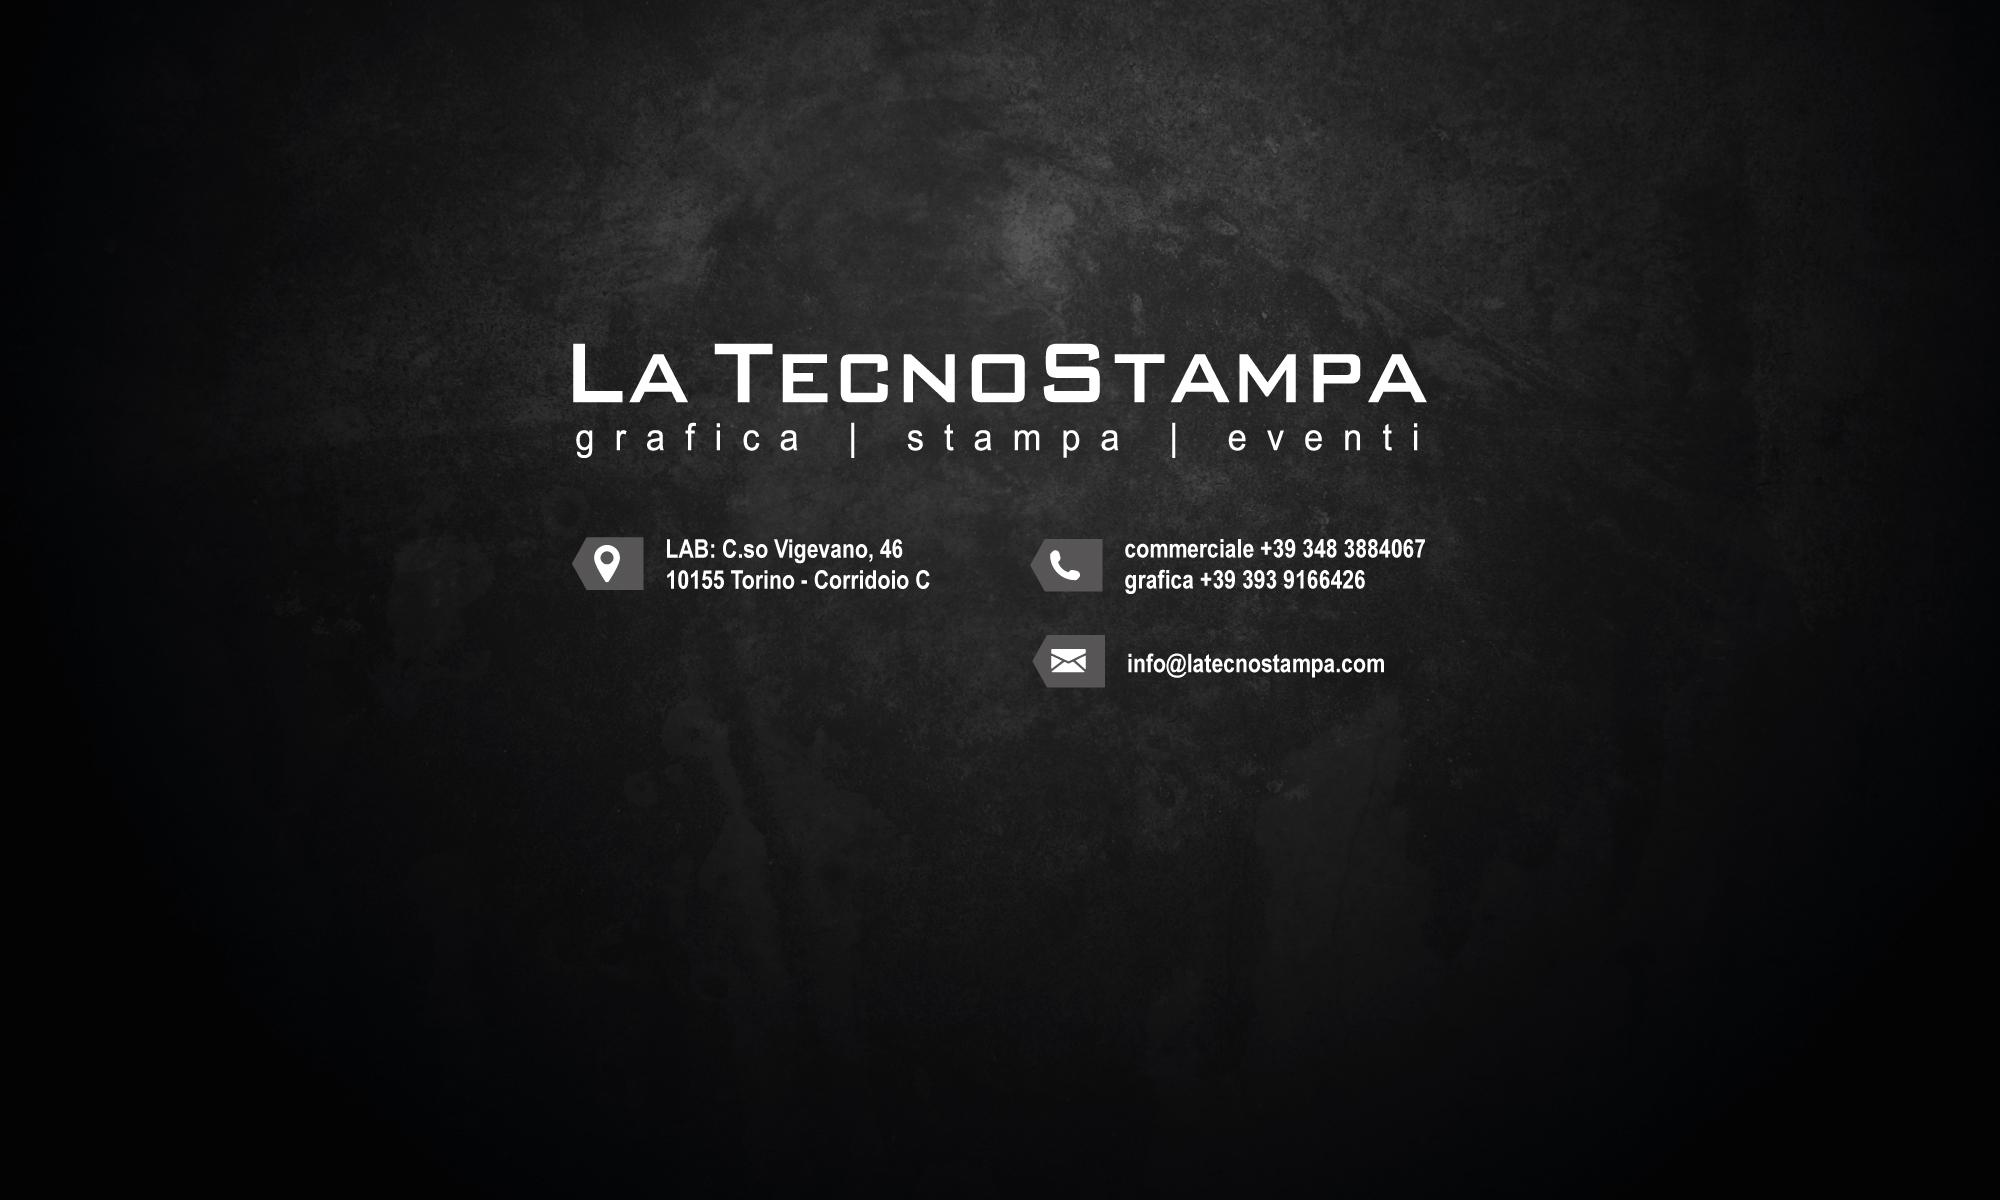 La Tecnostampa Srls